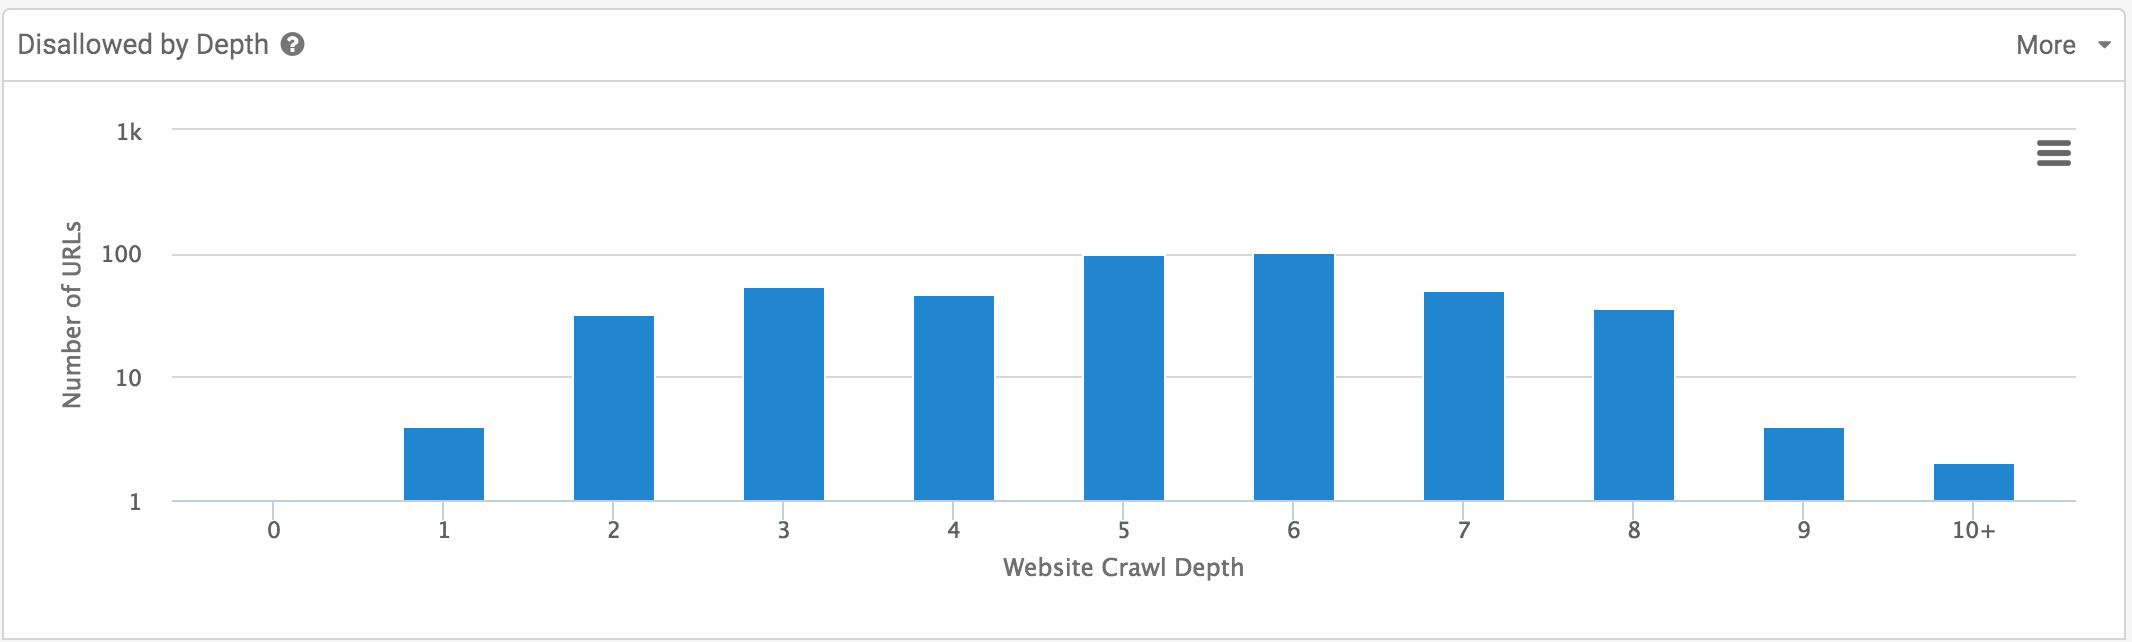 disallow index sitebulb